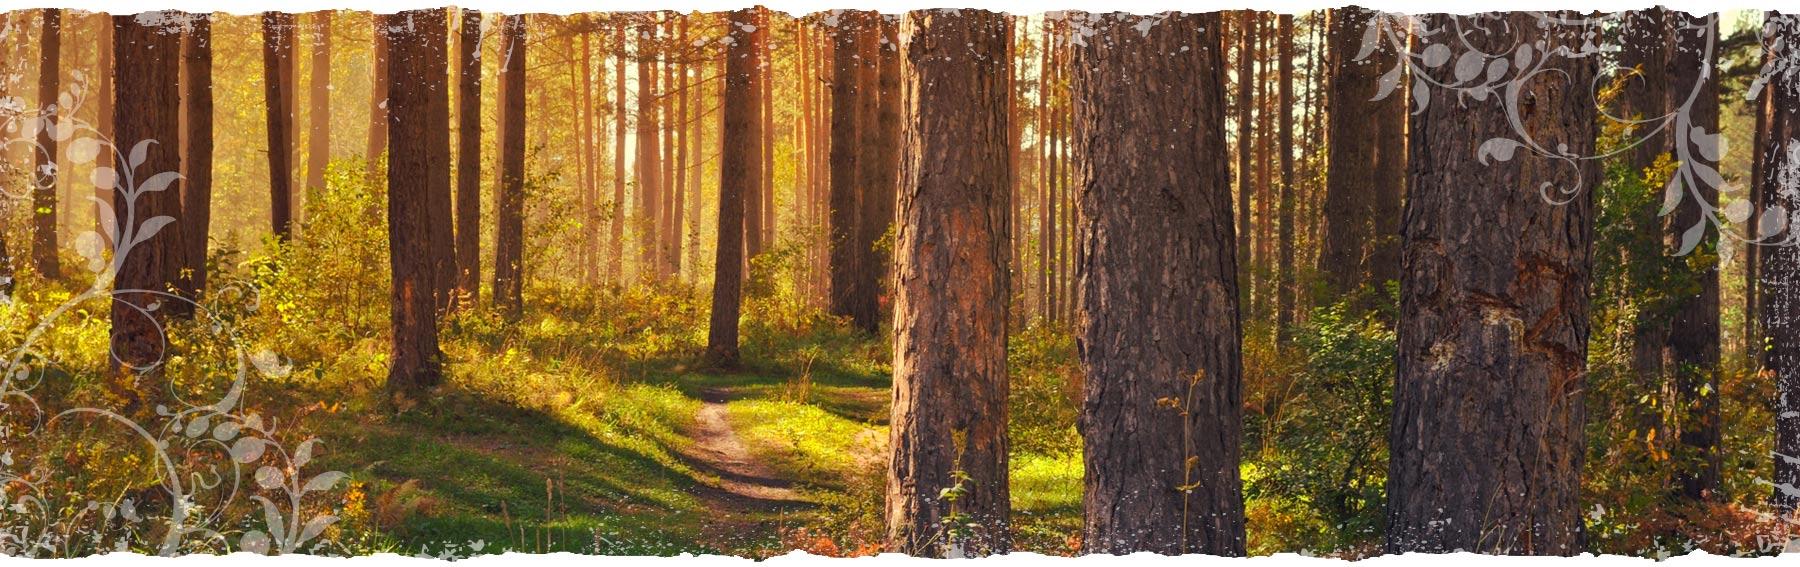 goldforest